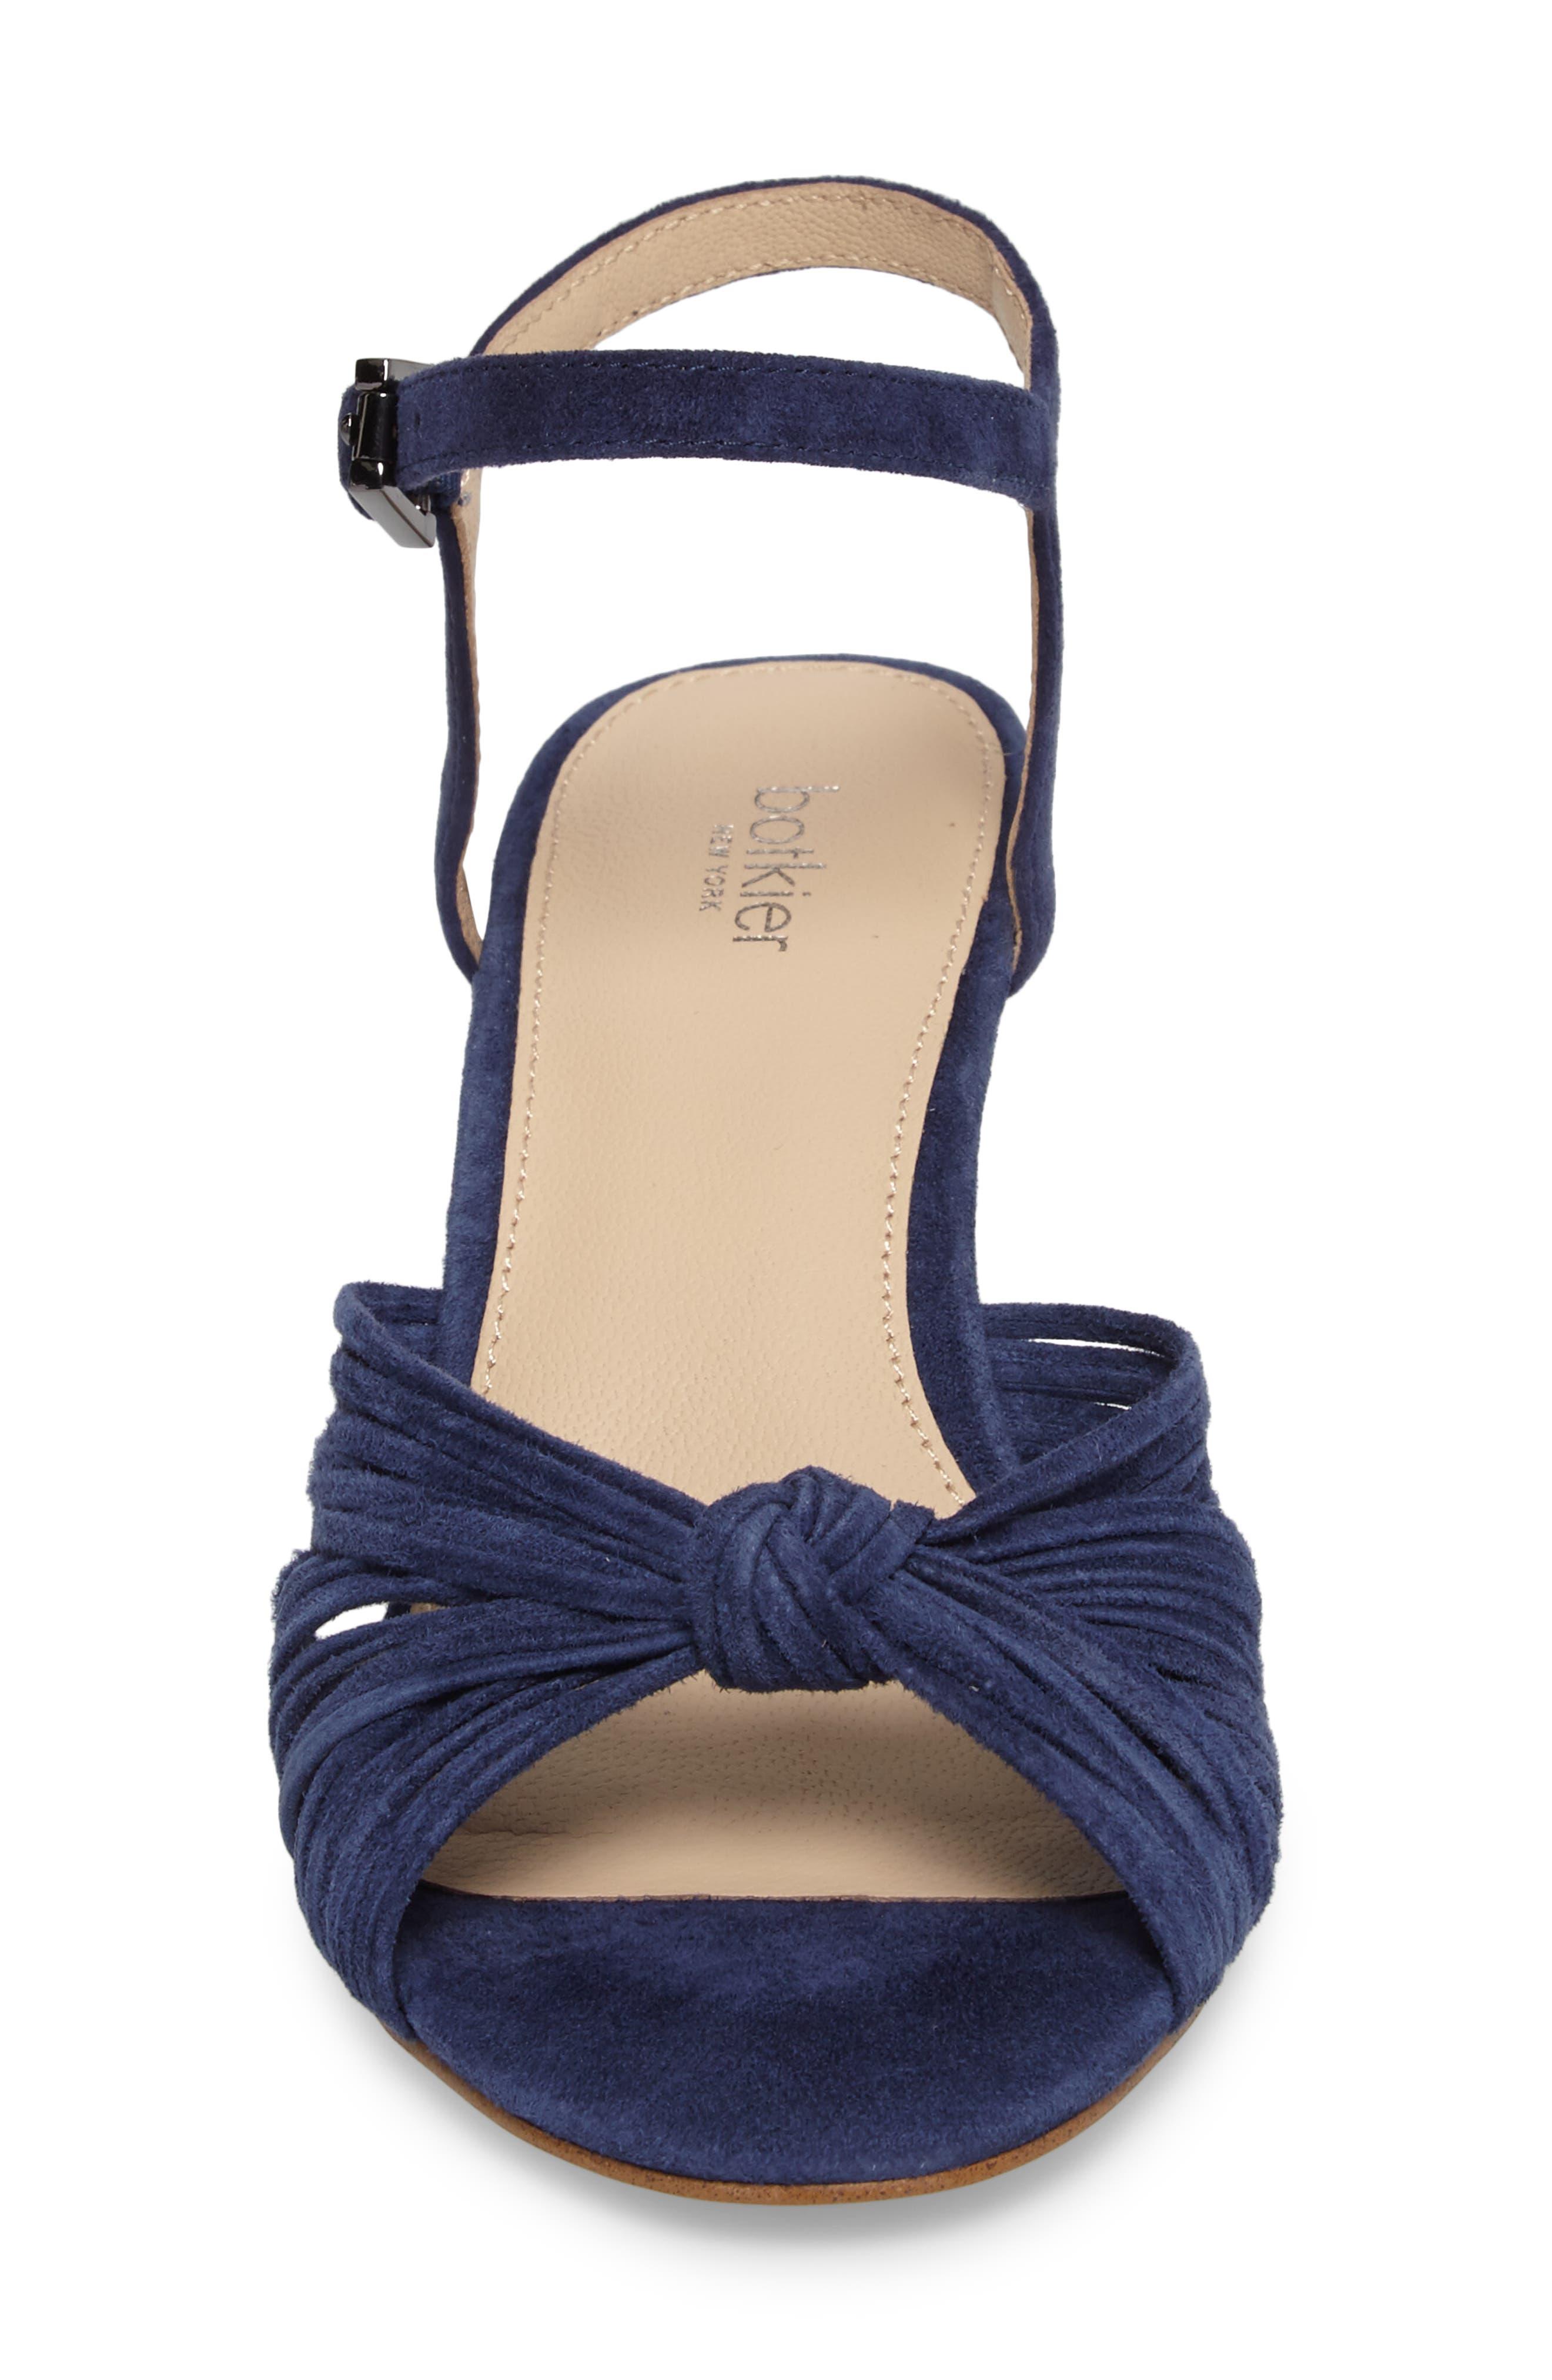 Patsy Block Heel Sandal,                             Alternate thumbnail 4, color,                             Navy